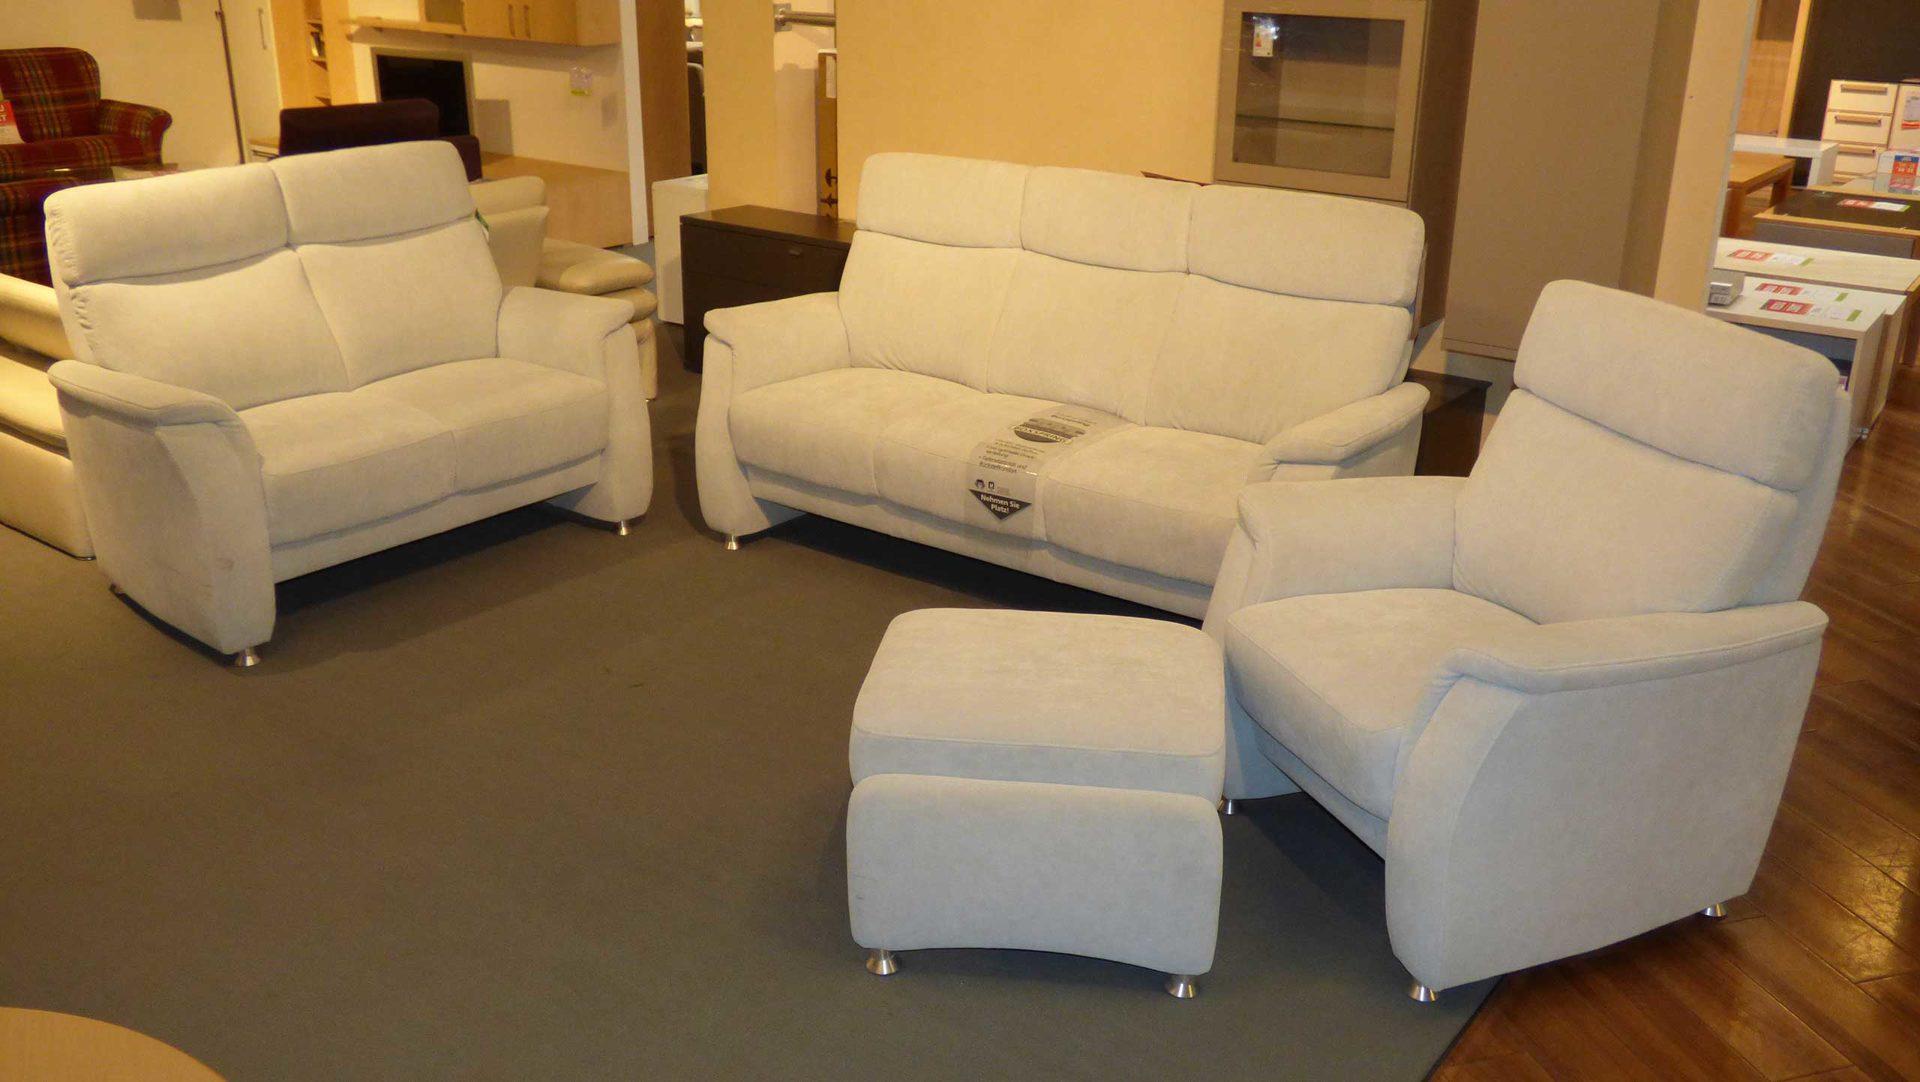 Sofa Arco Aus Stoff In Hellgrau Orthosedis Polstergarnitur 3600 Garnitur 3 2 1 Mit